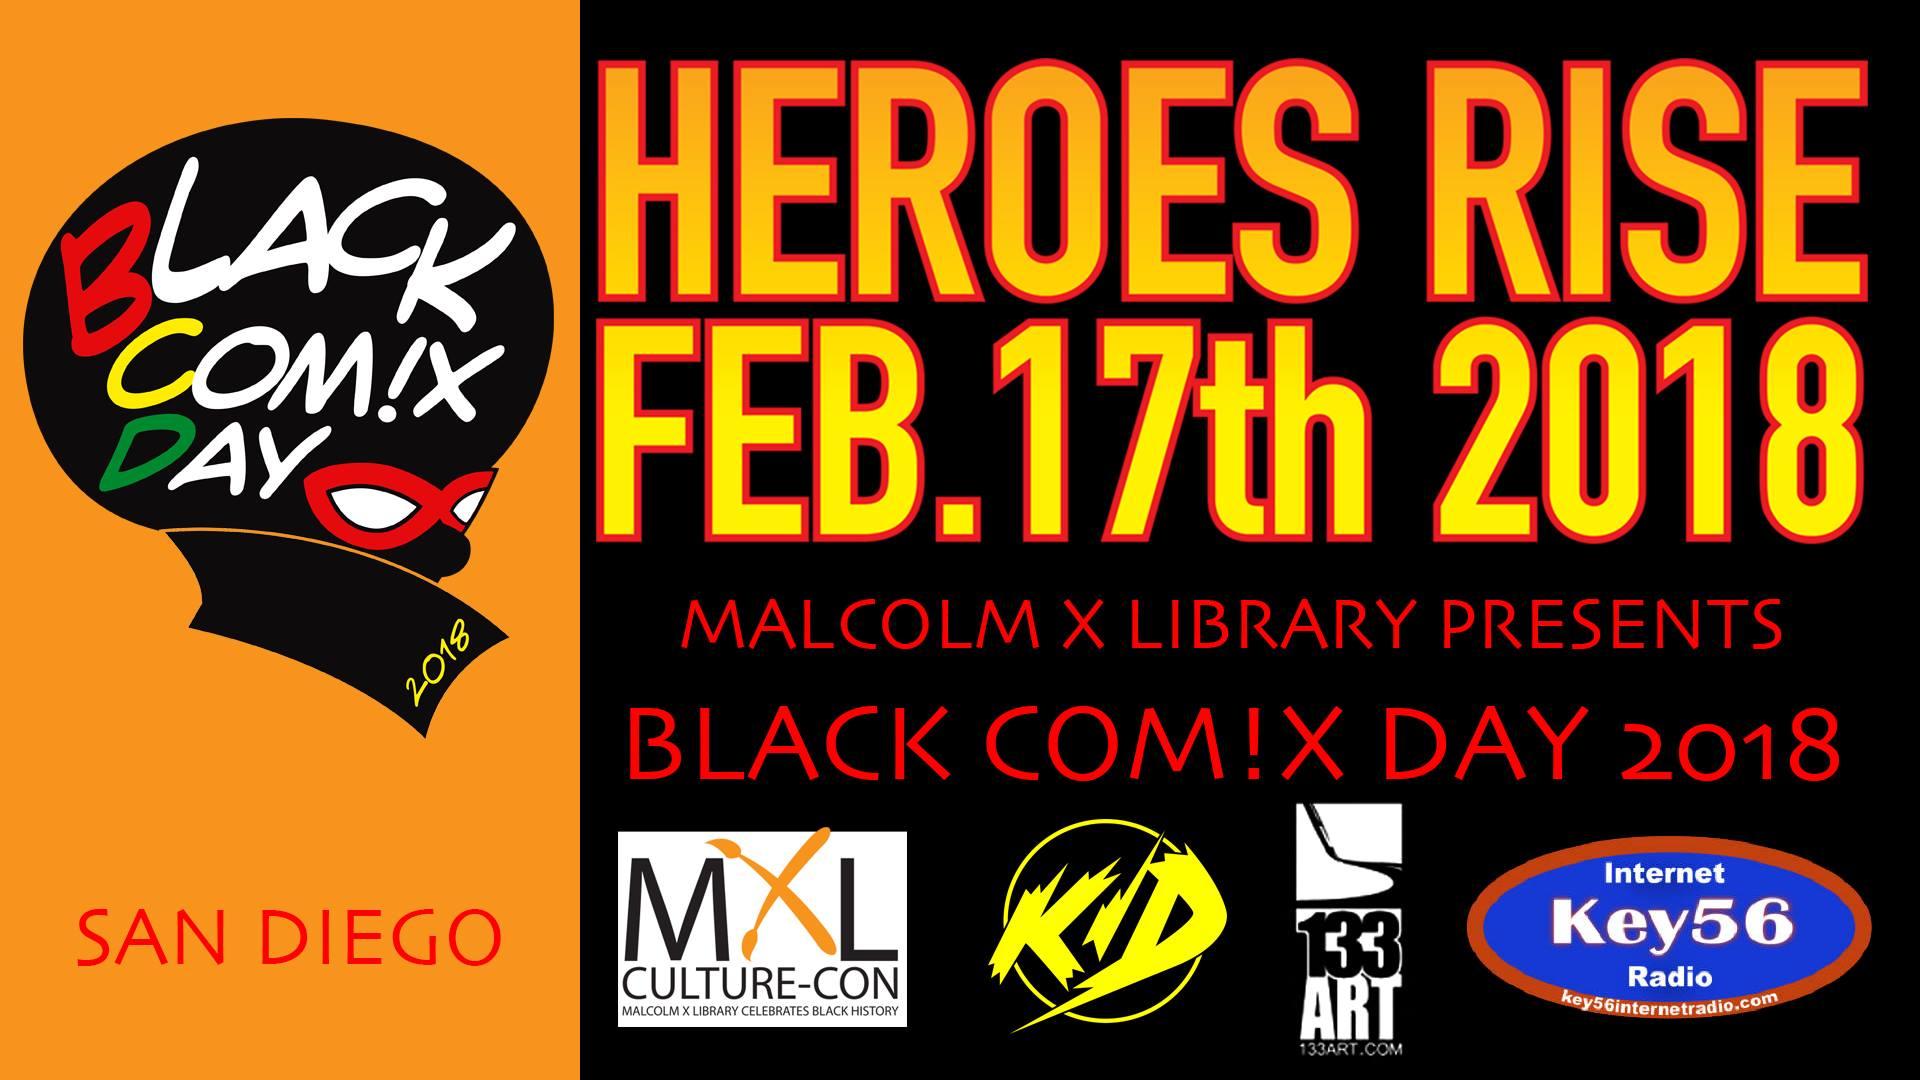 BLACK COM!X DAY 2018 @ Valencia Park/Malcolm X Library  | San Diego | California | United States